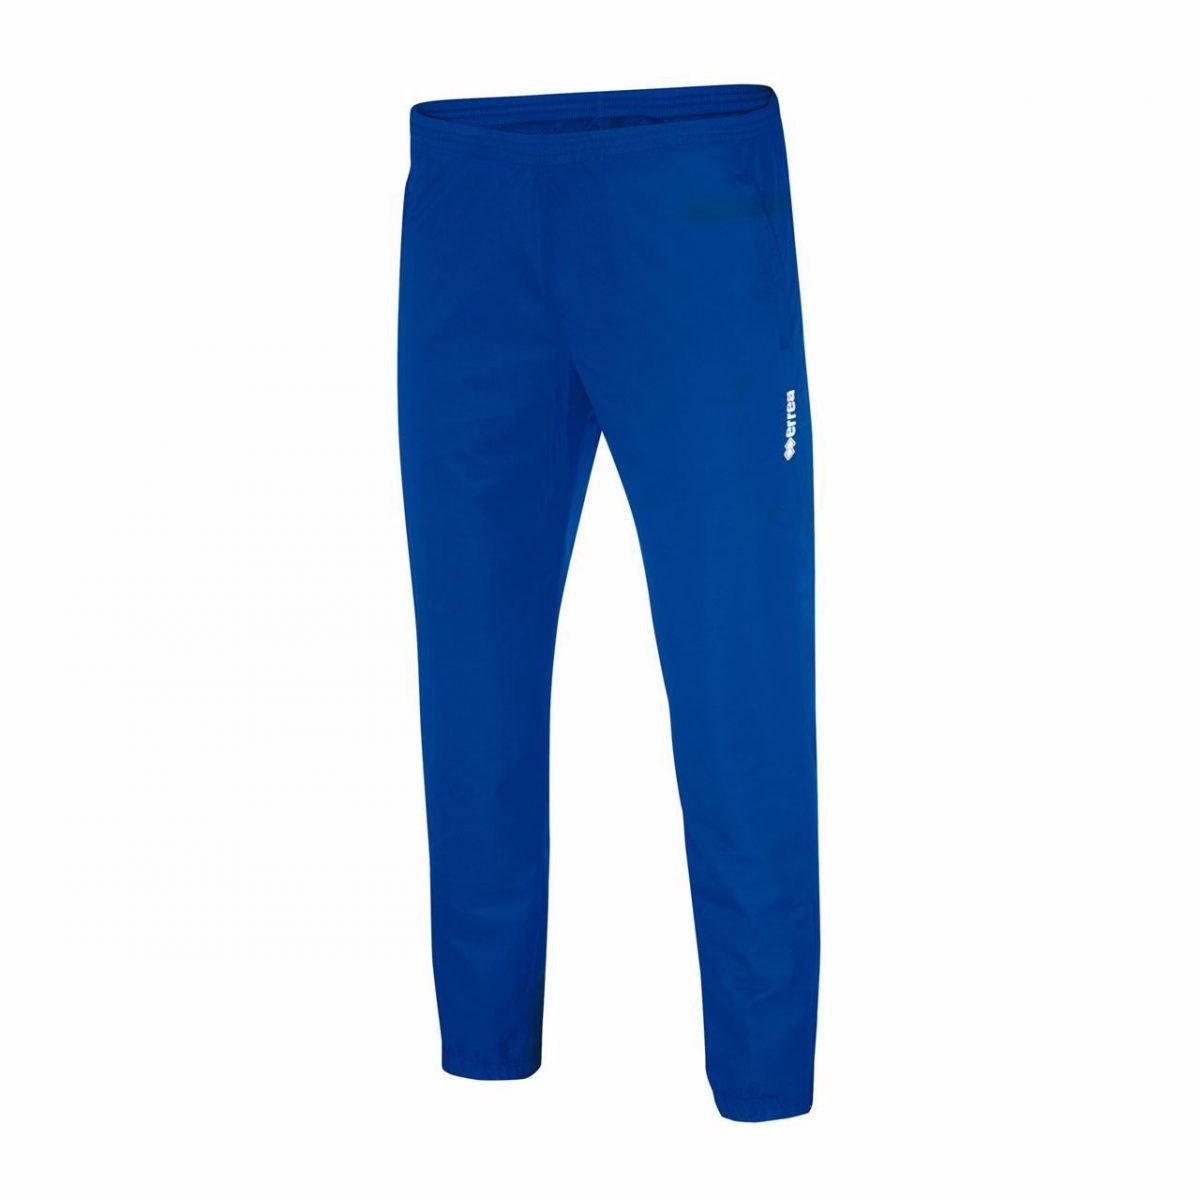 Errea AUSTIN 3.0 Trackpant Trousers FP790Z